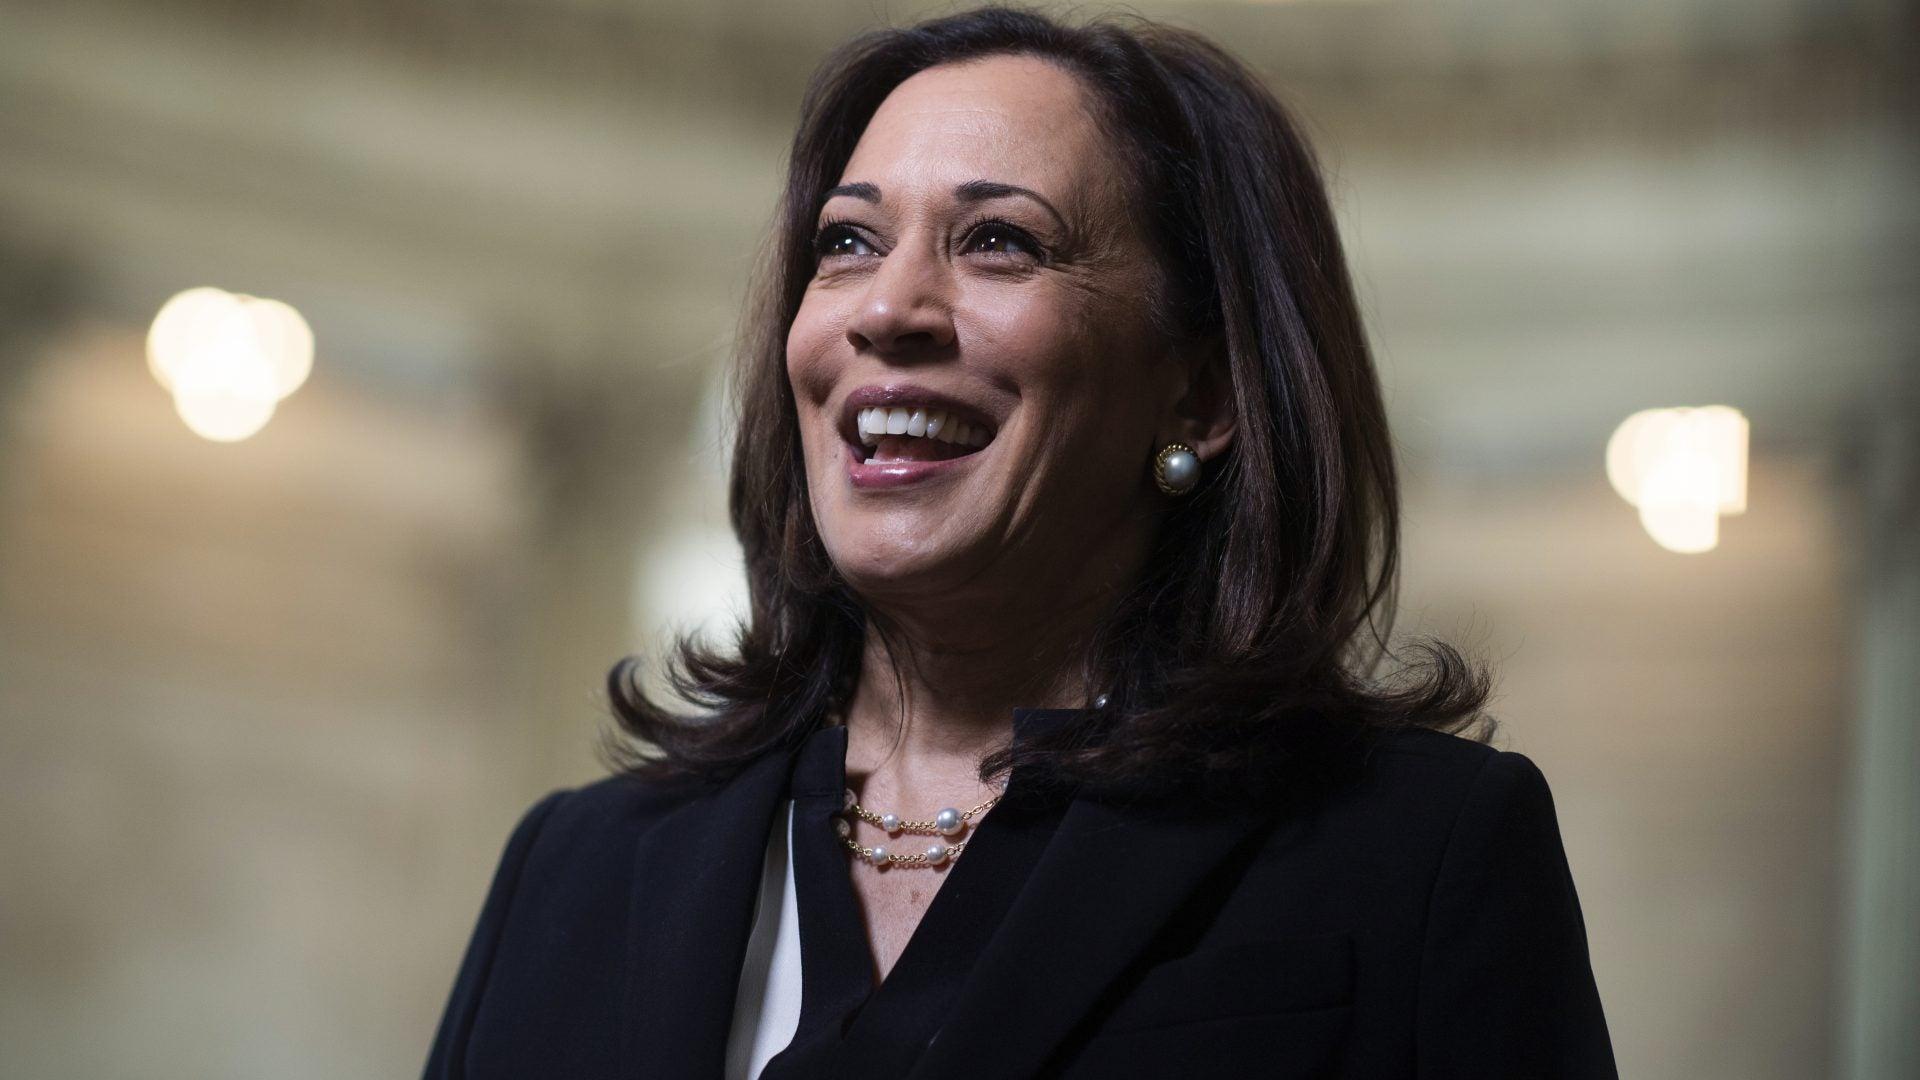 Joe Biden Picks Kamala Harris To Be His VP